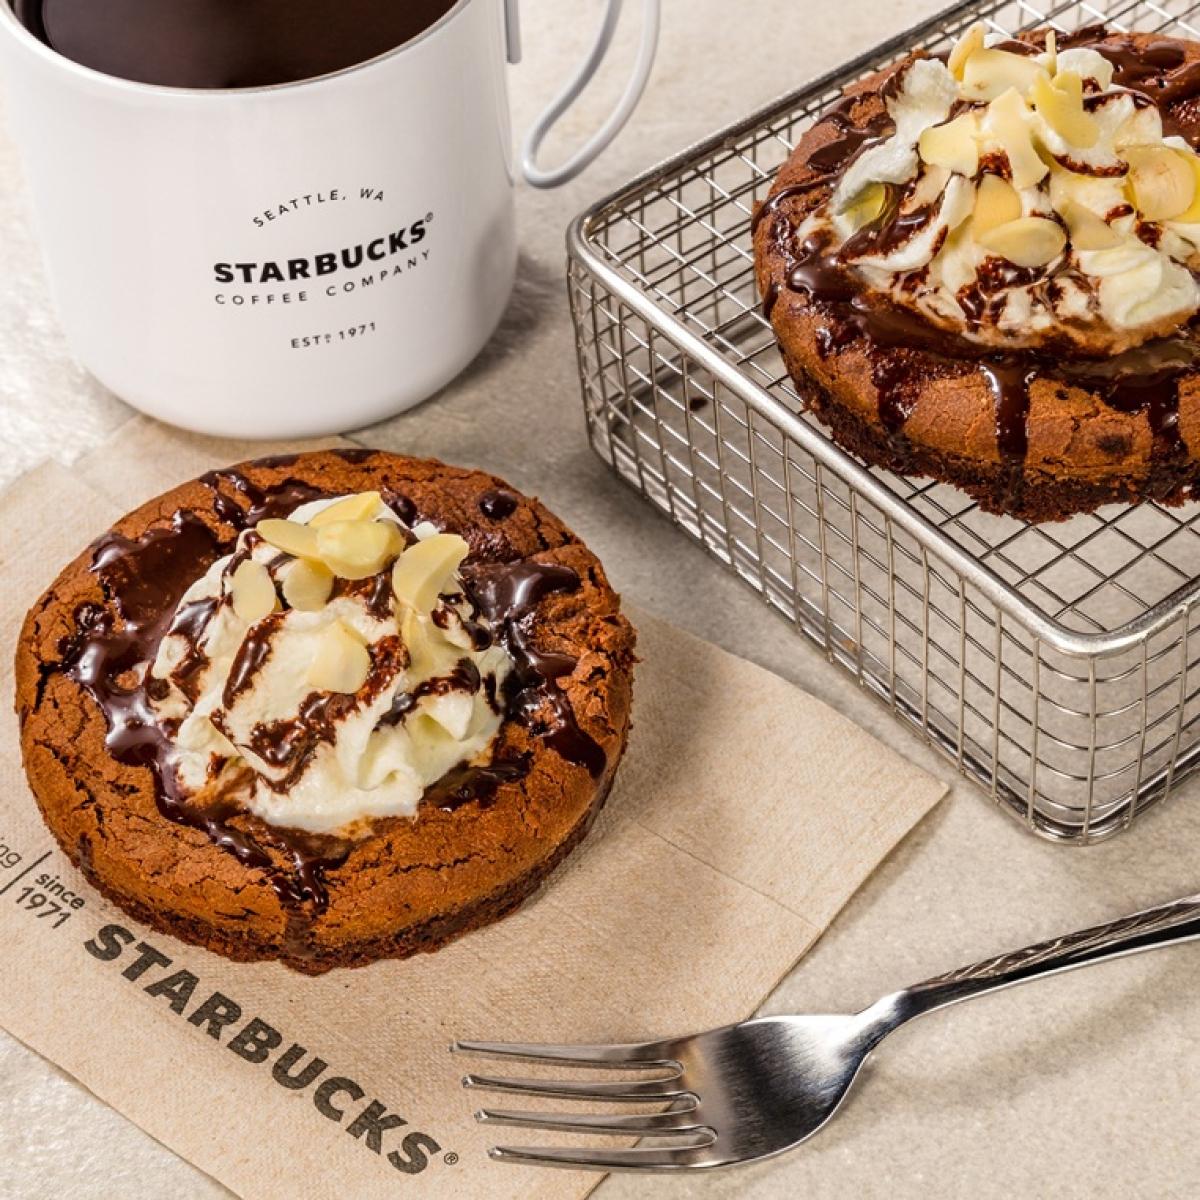 Mumbai Food Review: Coffee and munchies